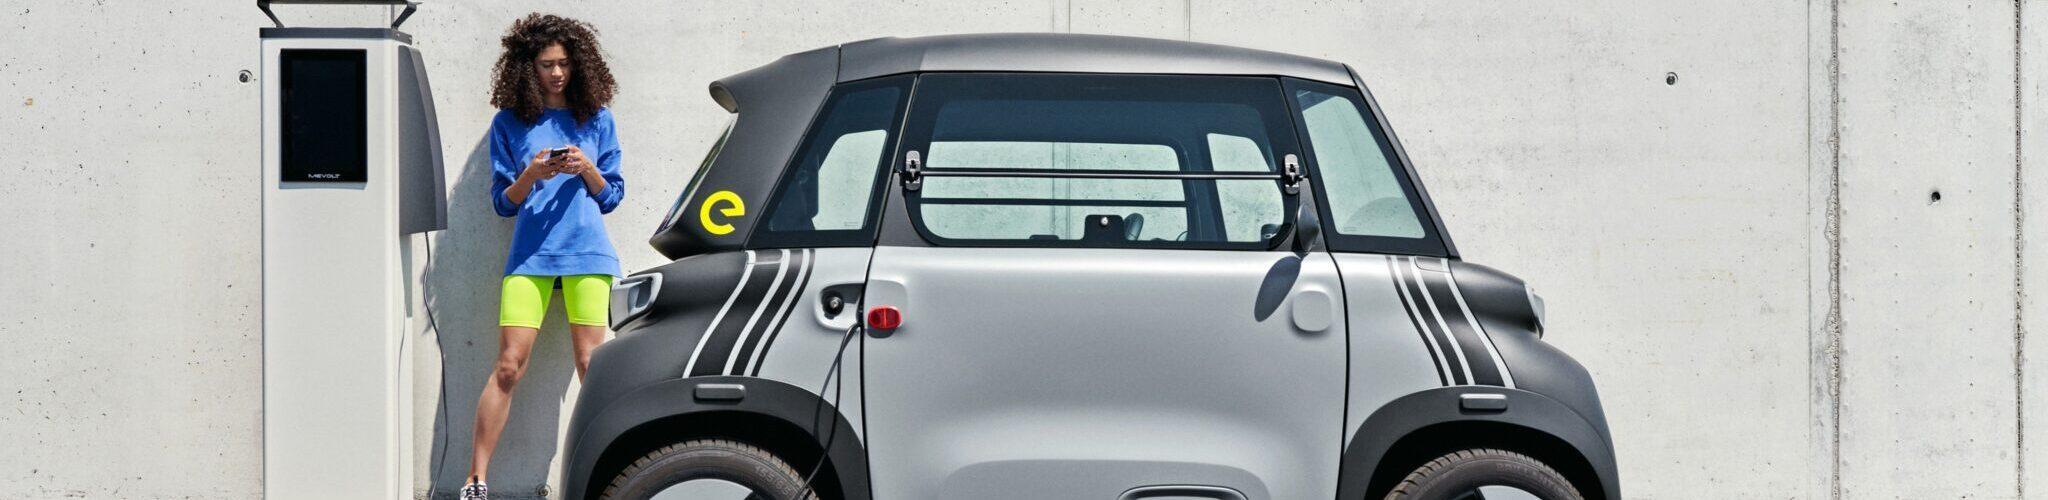 электромобиль Opel Rocks-e